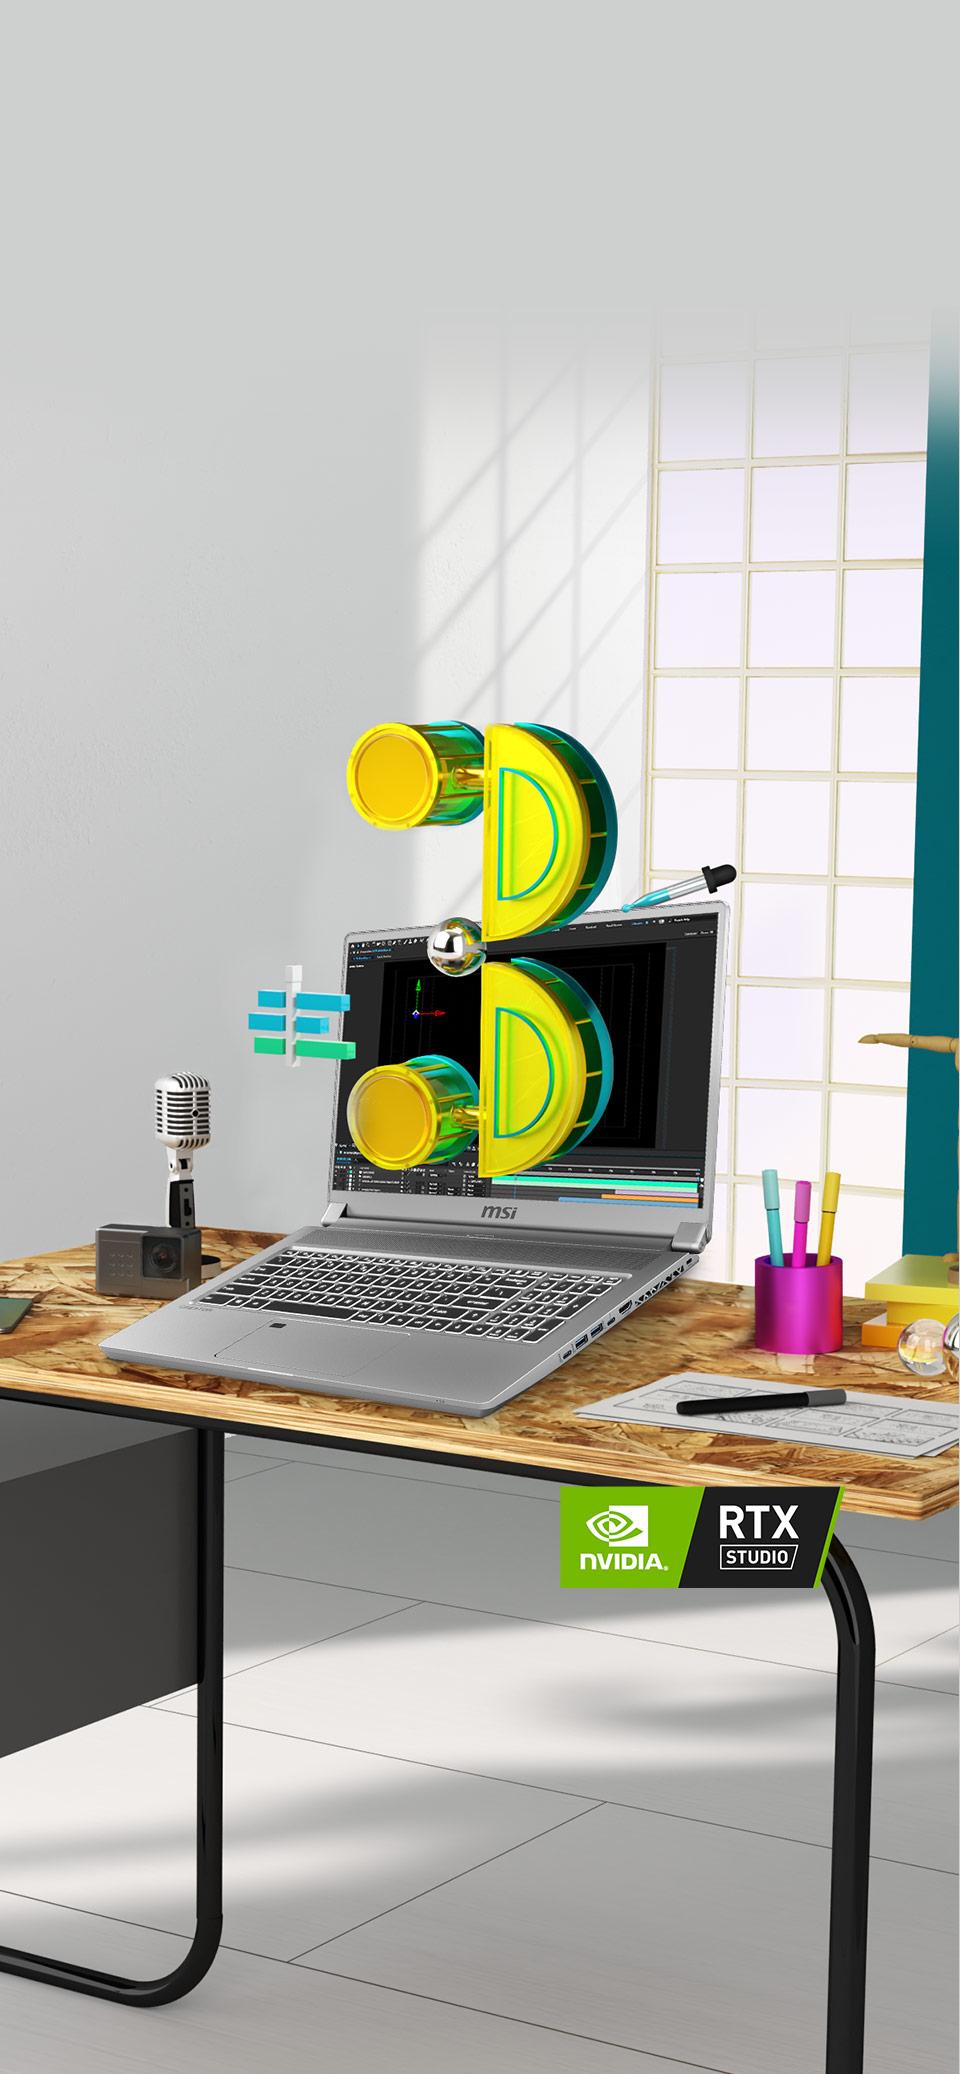 msi laptops main banner